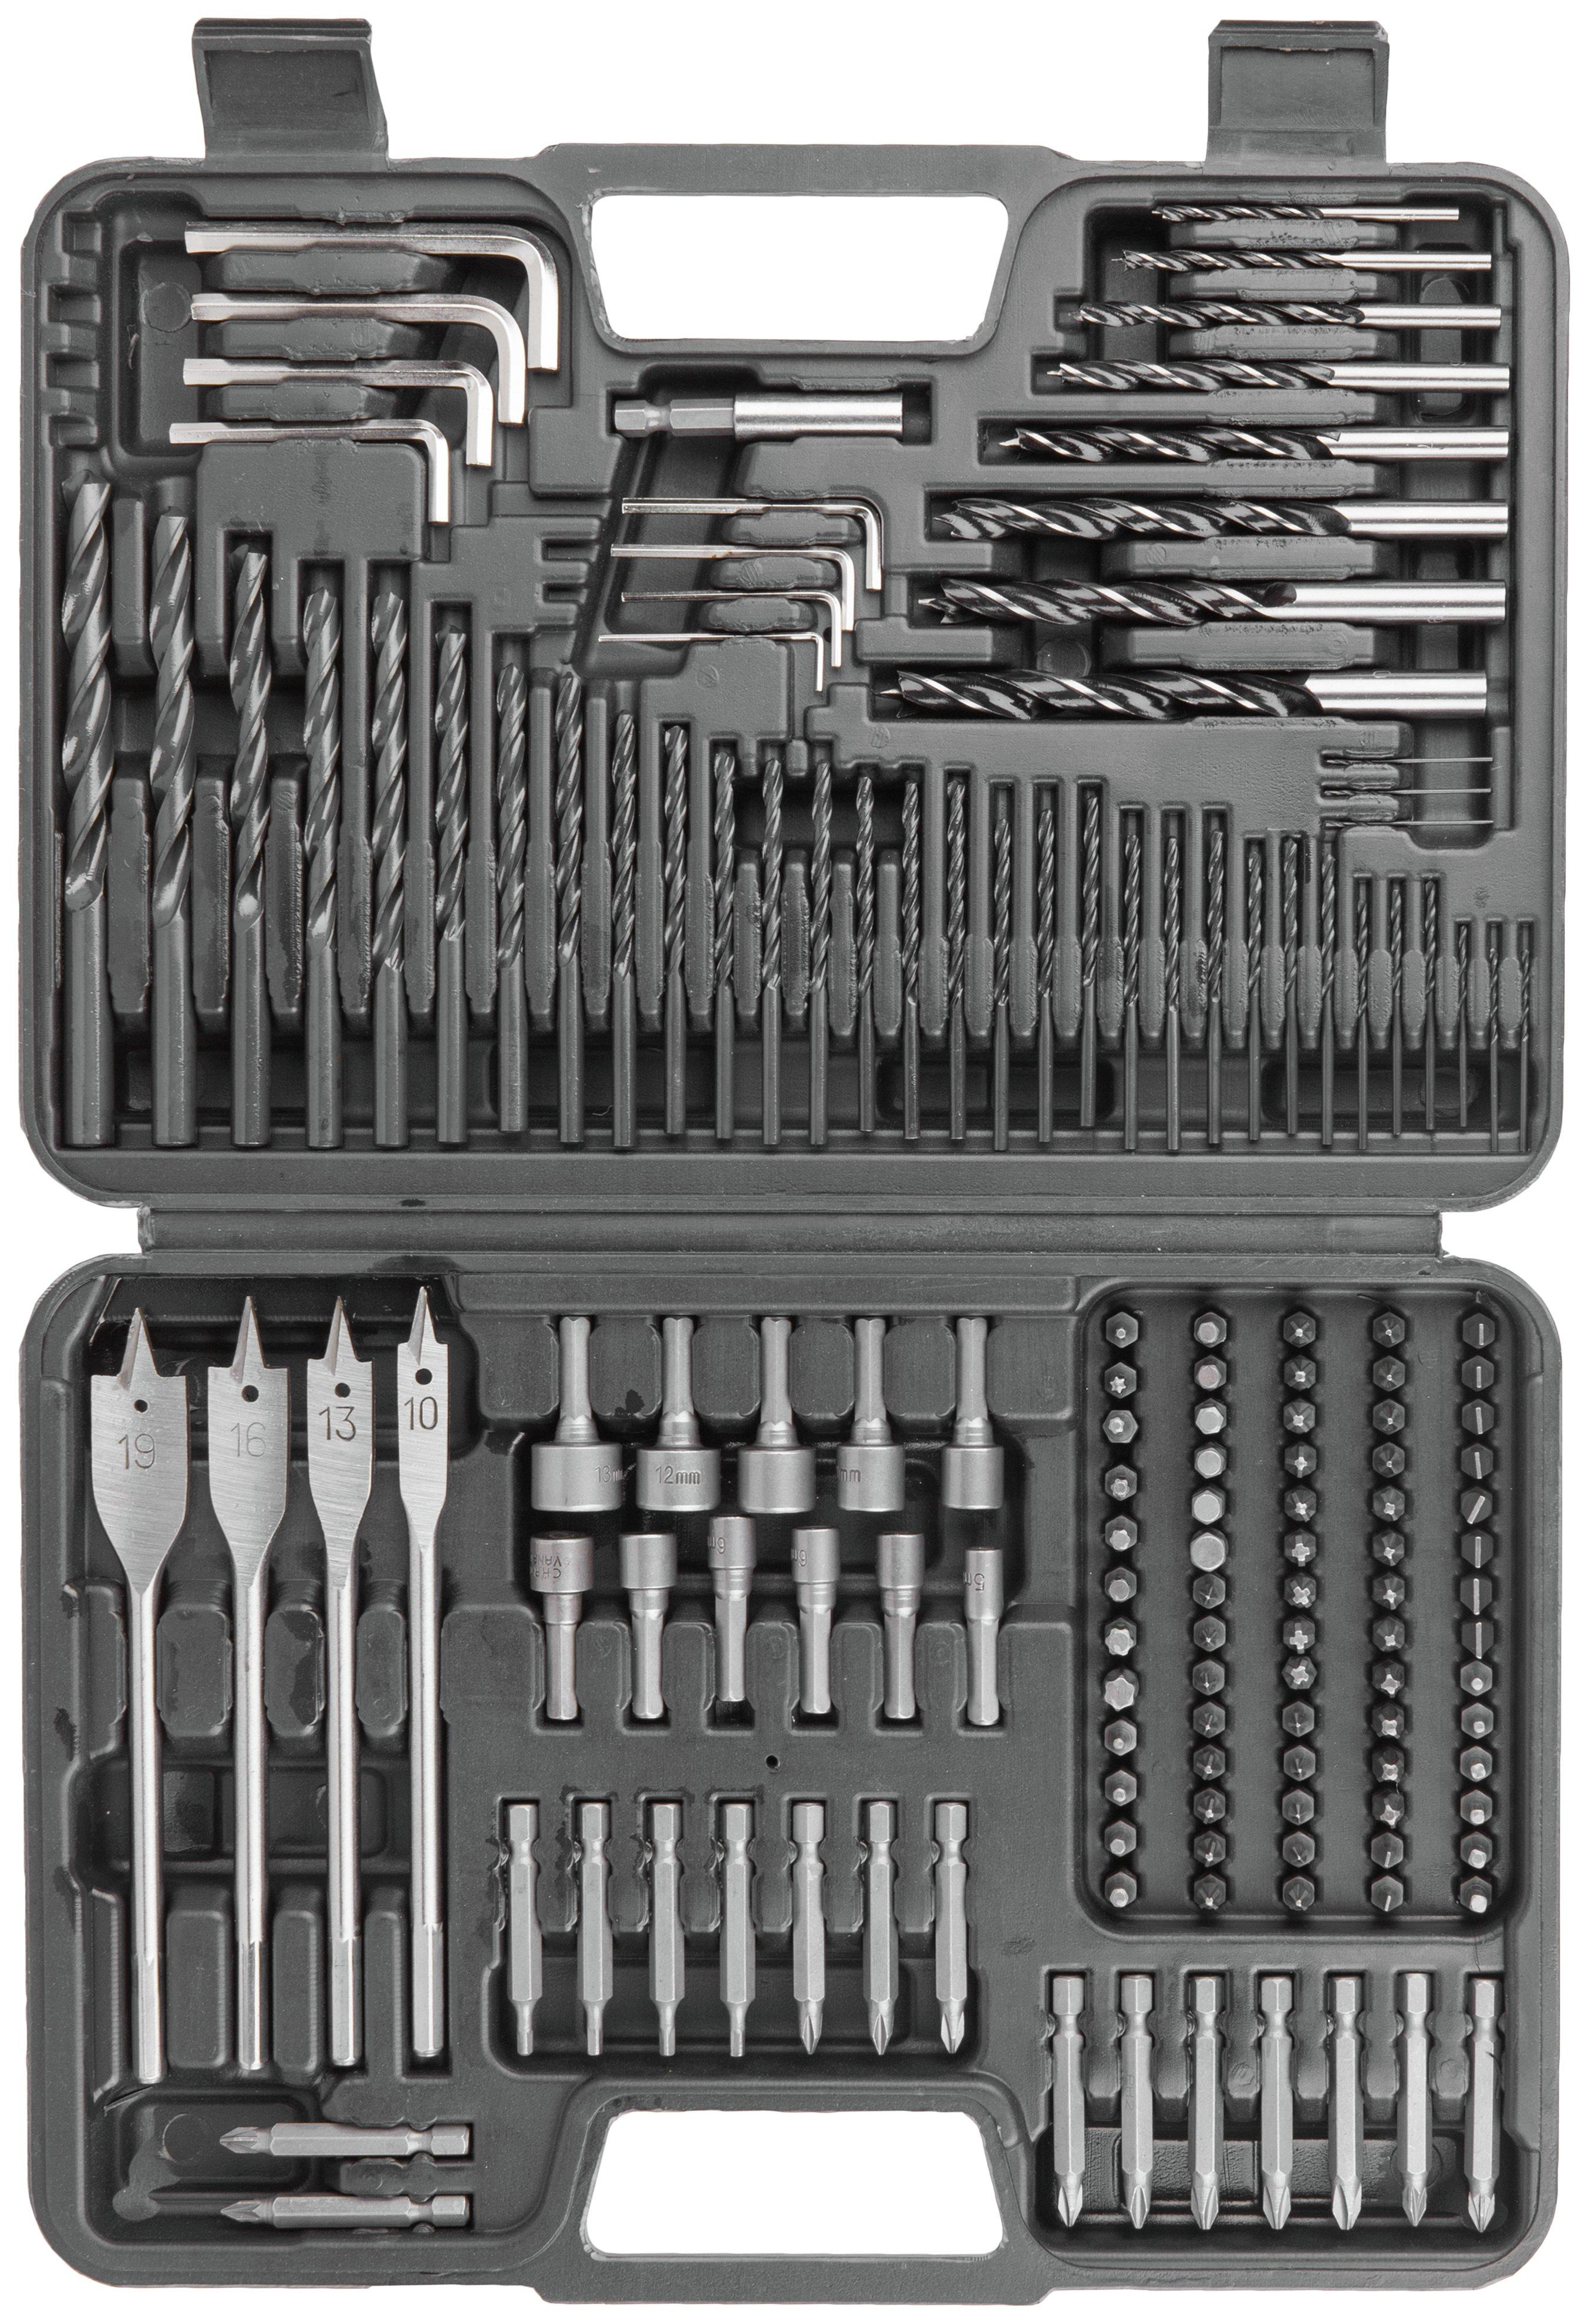 Image of Guild - 150 Piece Drill Bit Set